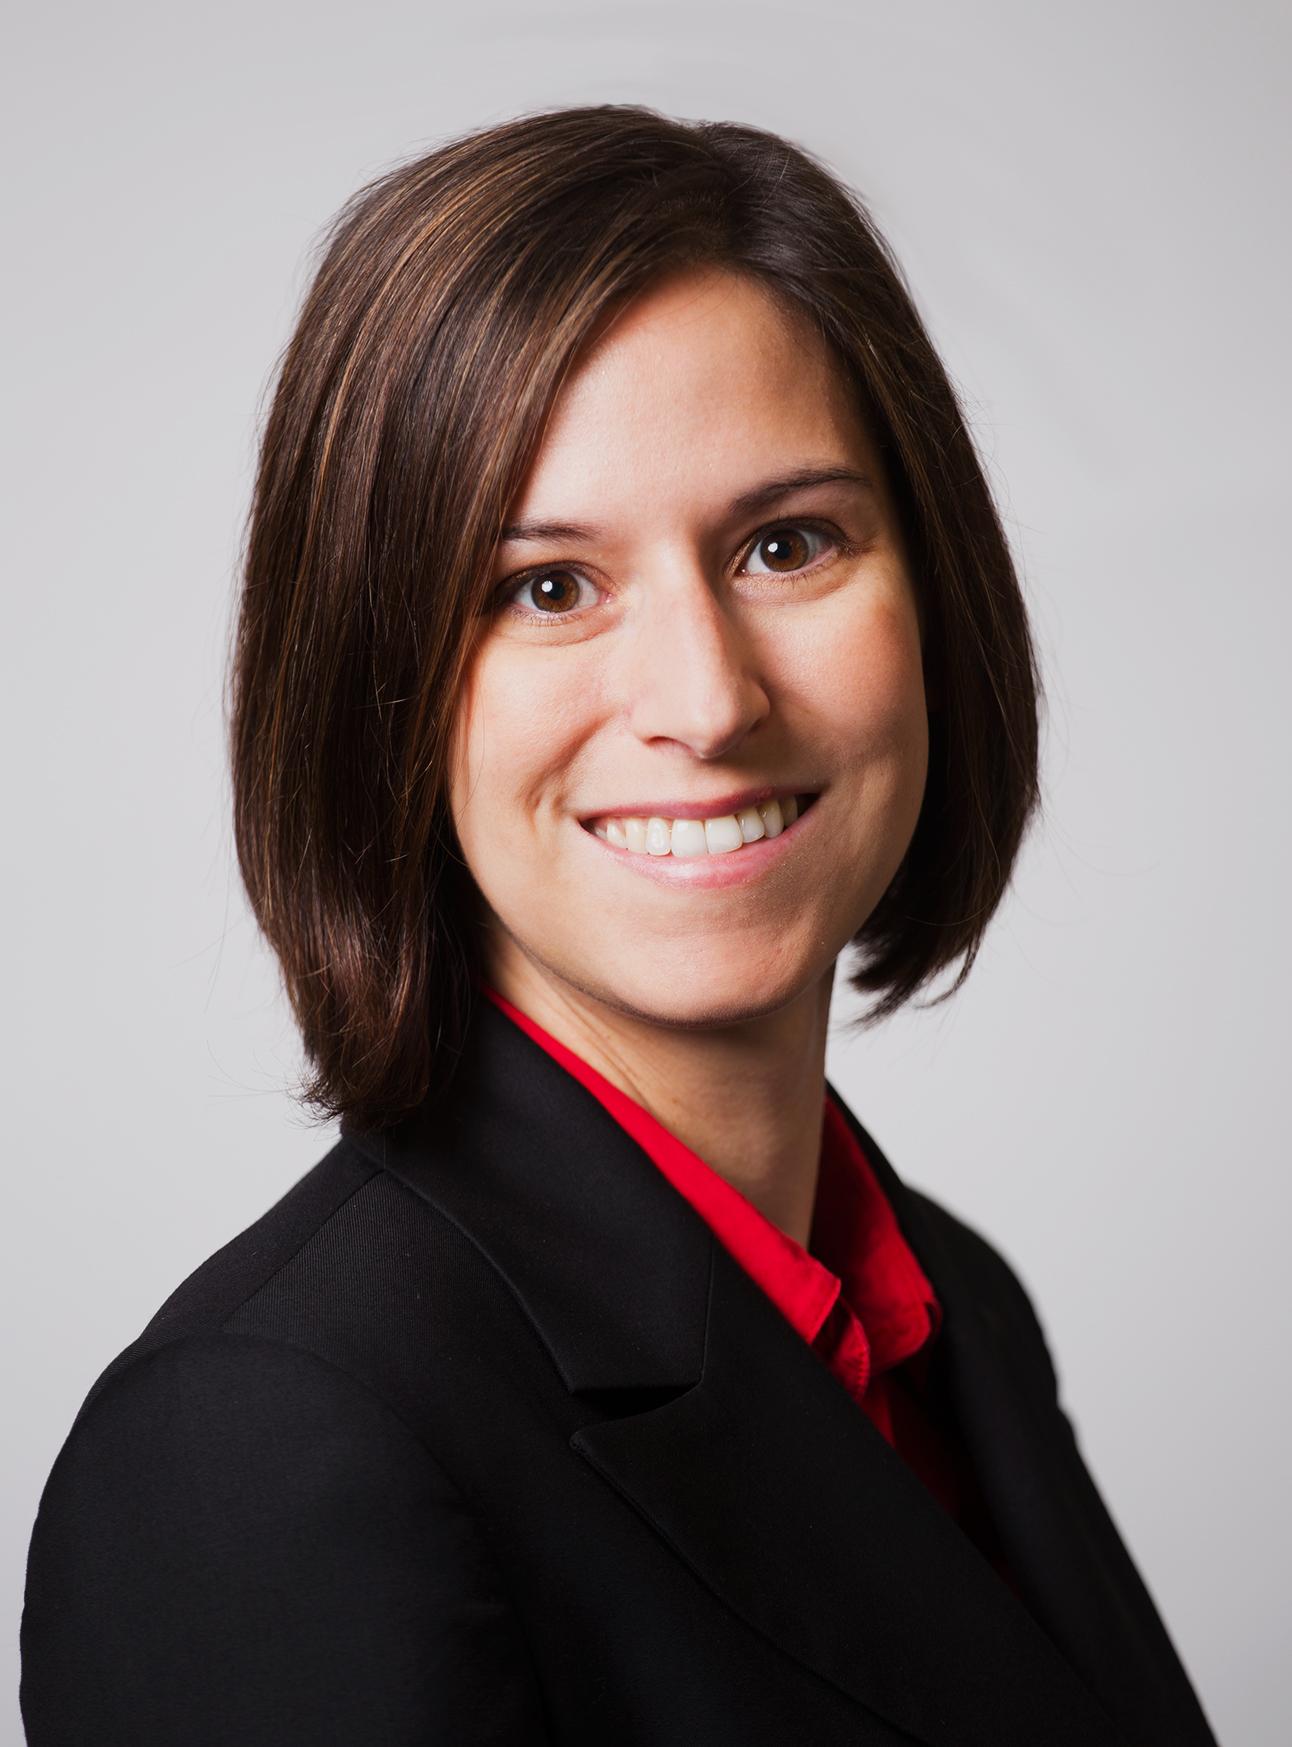 Jennifer Winter, Ph.D